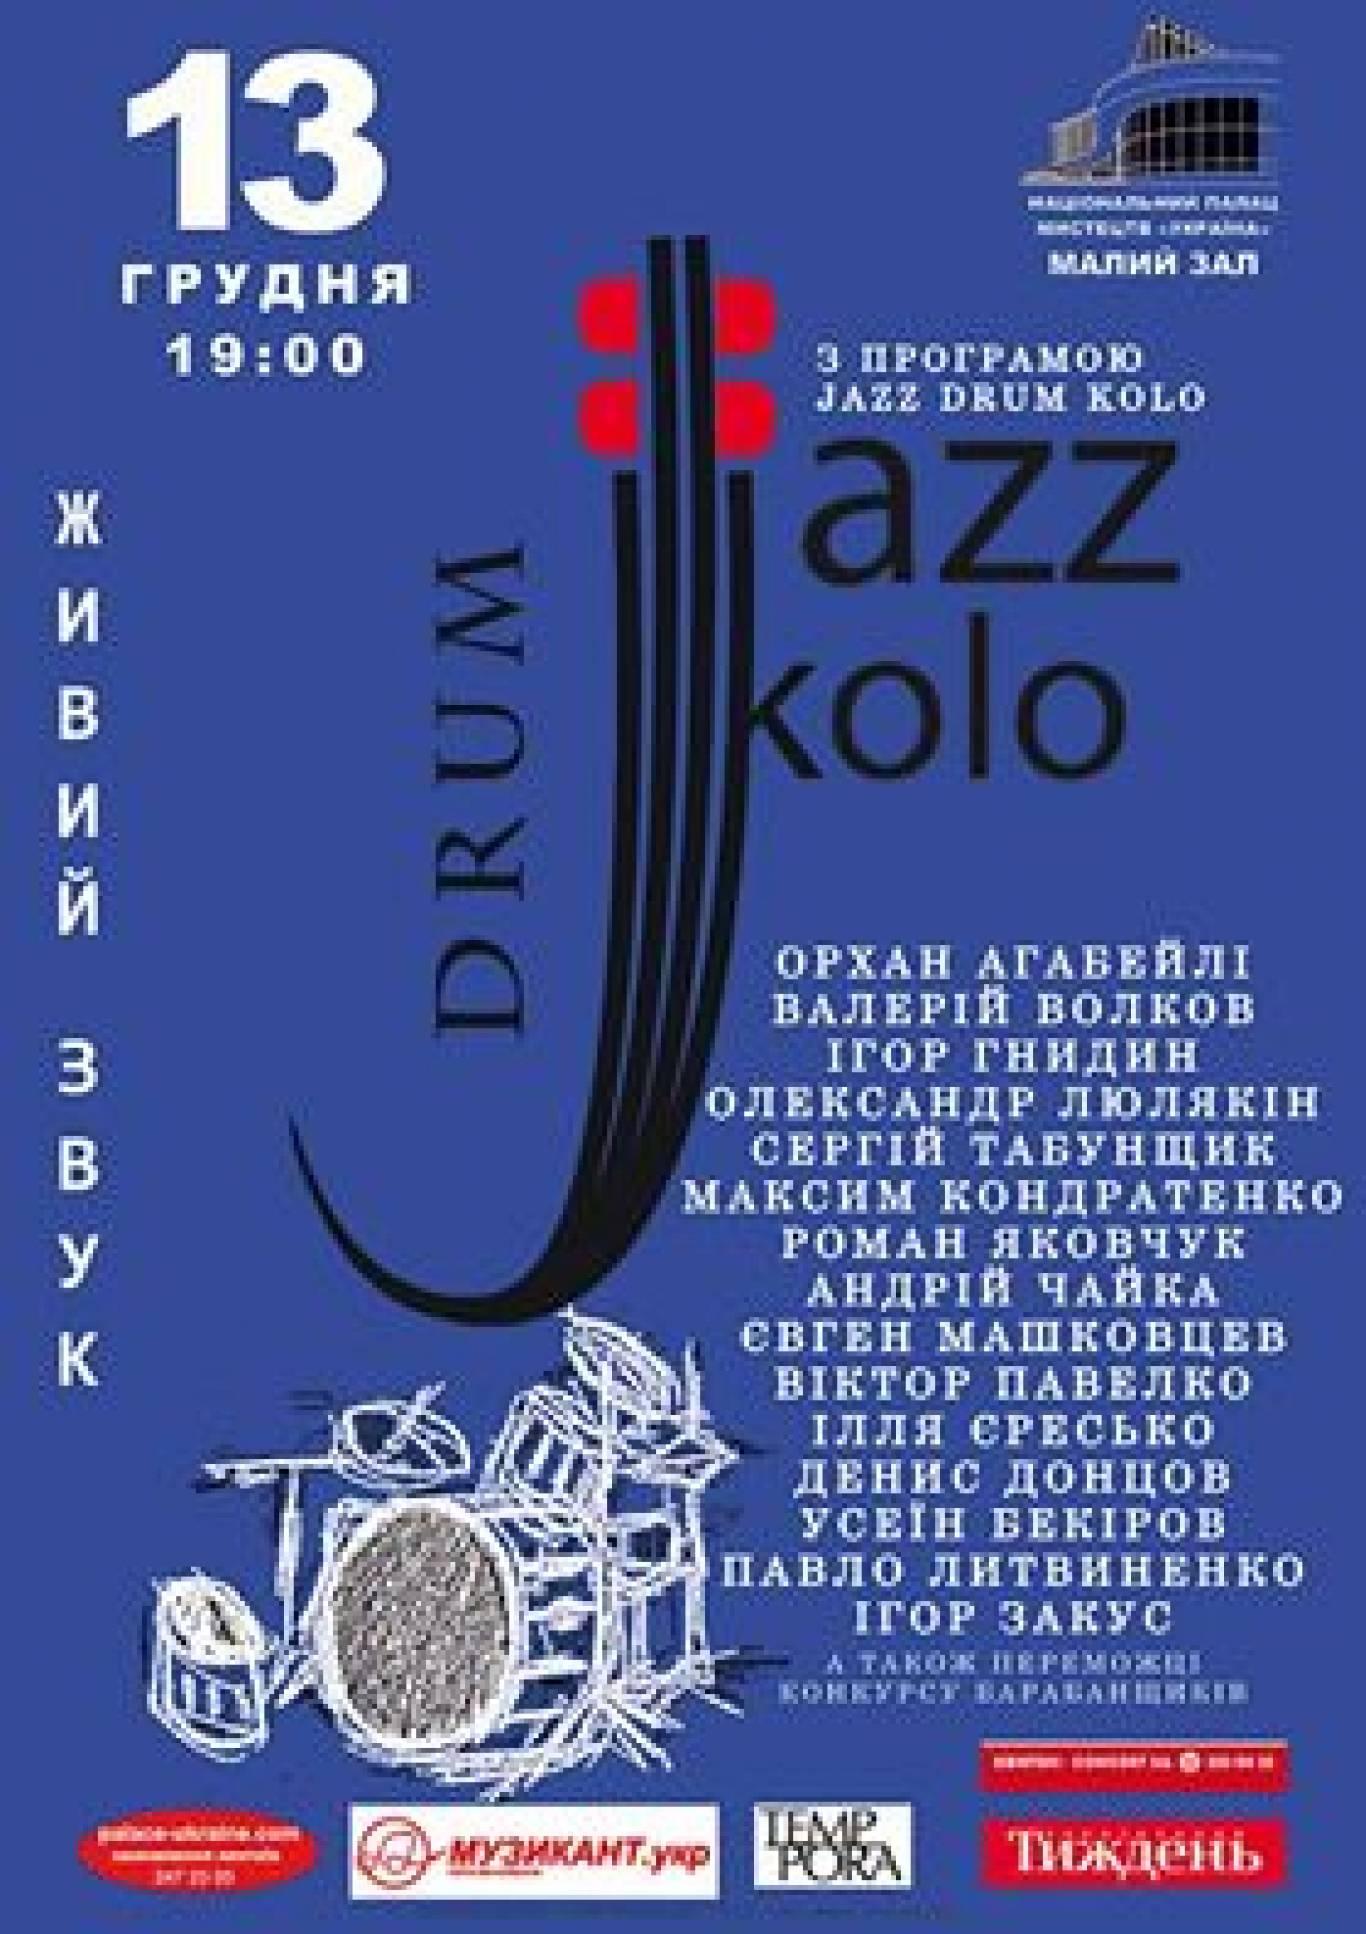 Jazz Drum Kolo